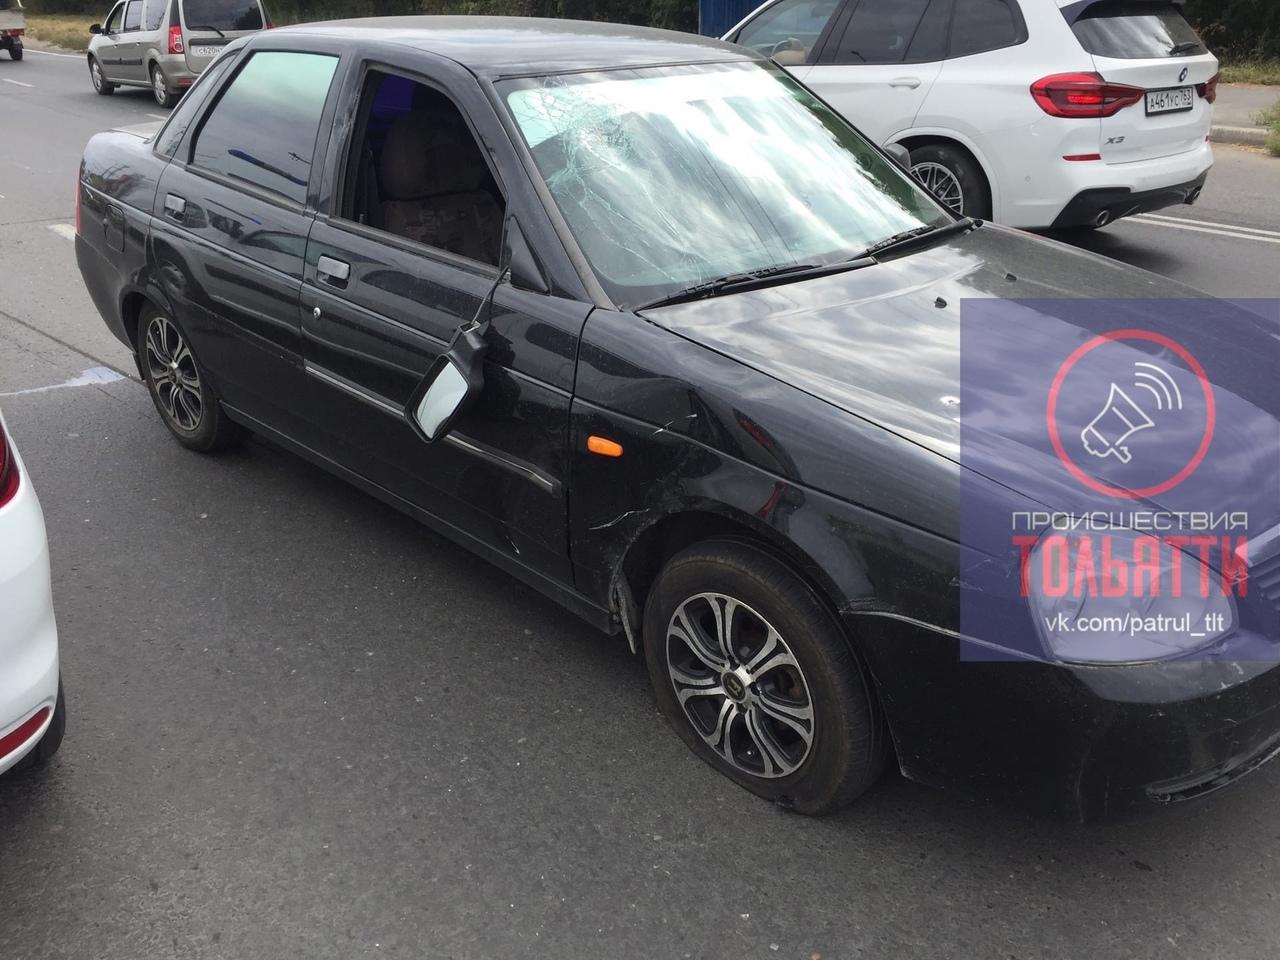 Видео: в Тольятти велосипедист попал под колеса легковушки